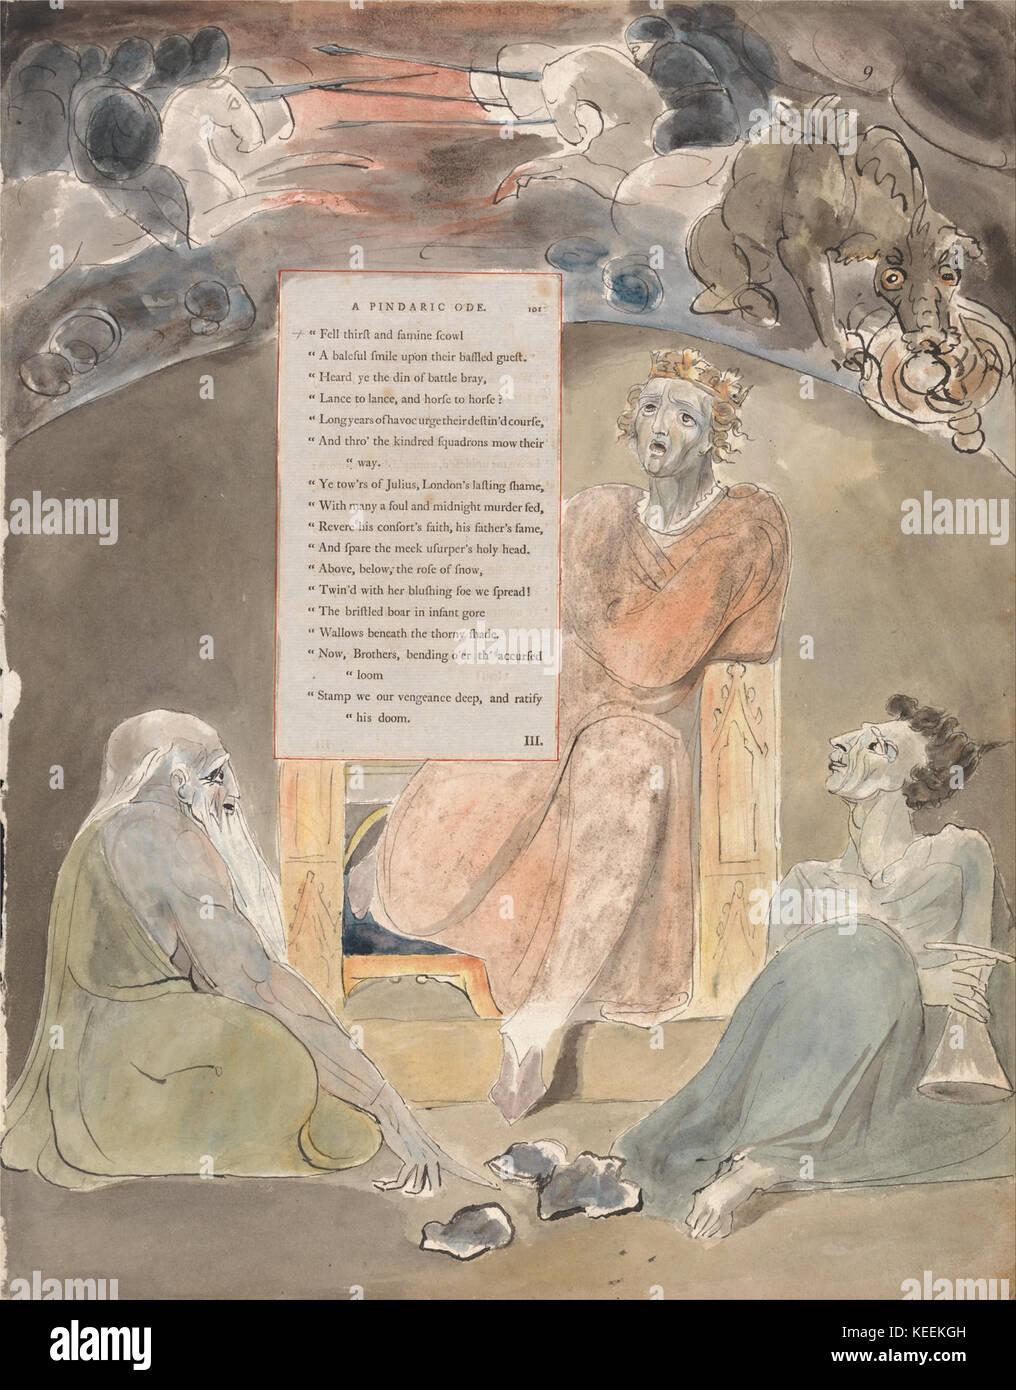 William Blake The Poems Of Thomas Gray Design 61 Bard